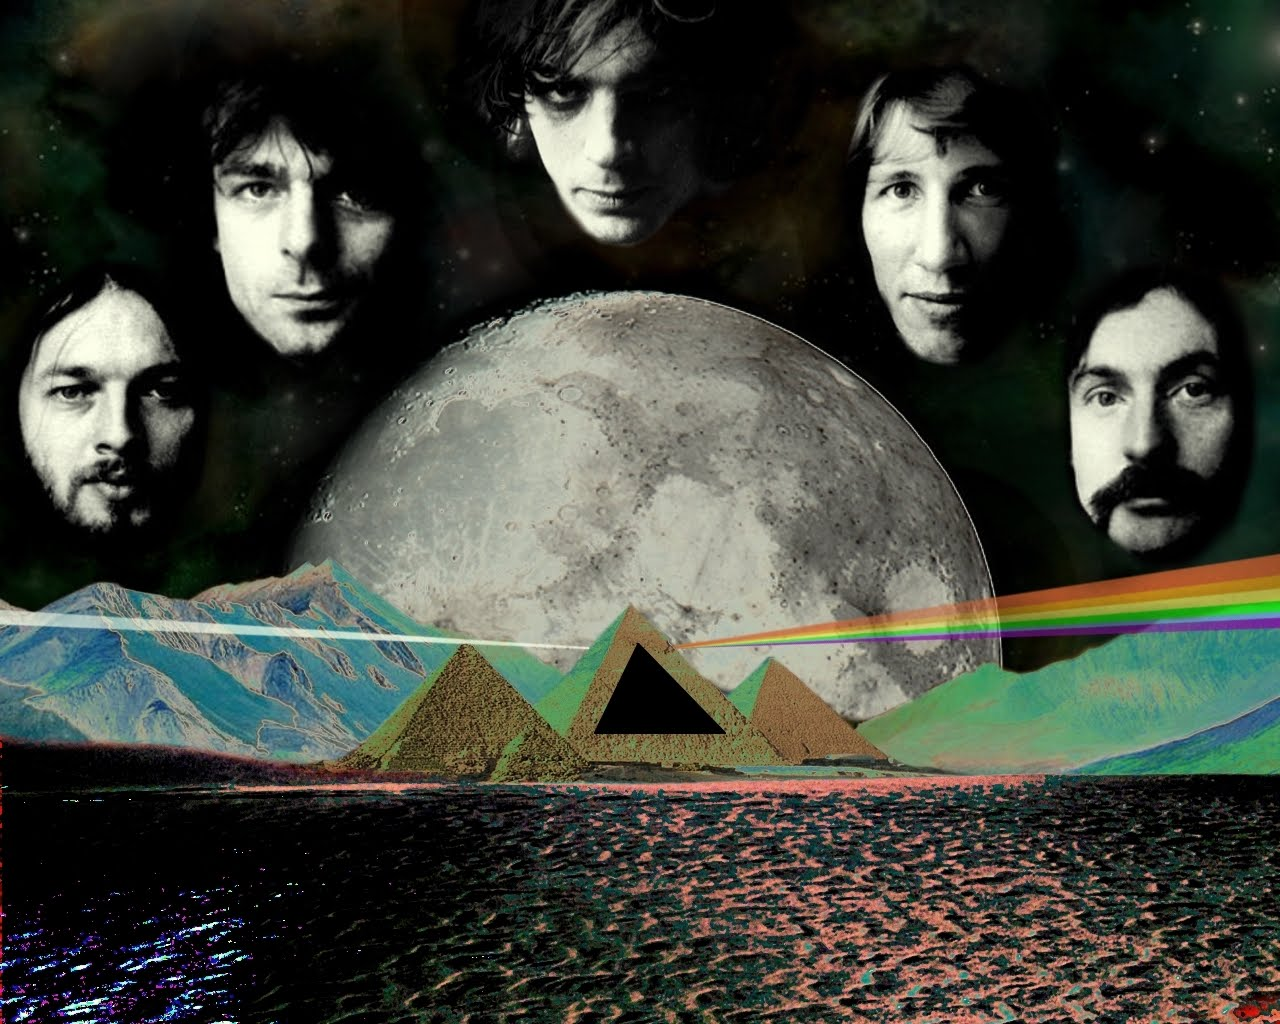 http://3.bp.blogspot.com/_u1dy2nv5qds/TROKeJg5LLI/AAAAAAAAAKo/Txg4mY82tWs/s1600/Pink_Floyd_by_Brosky.jpg